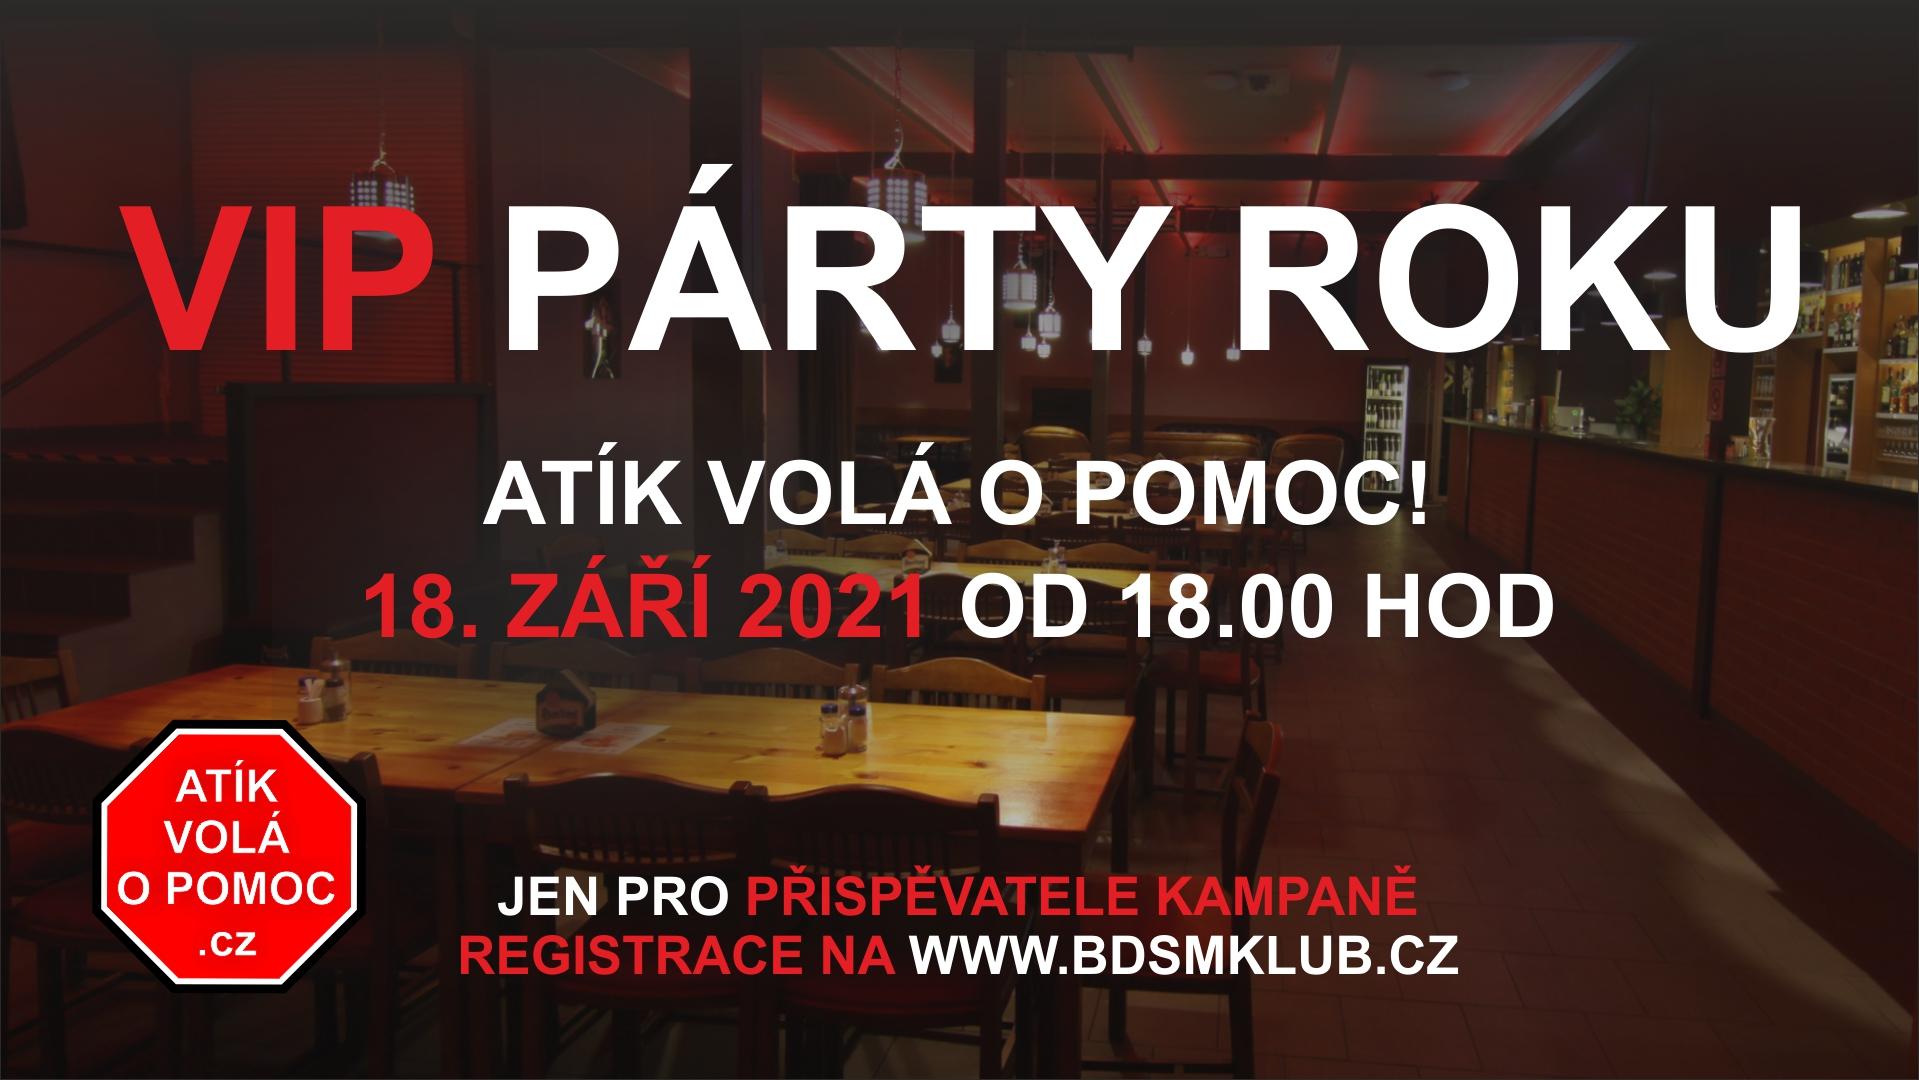 VIP PARTY ROKU